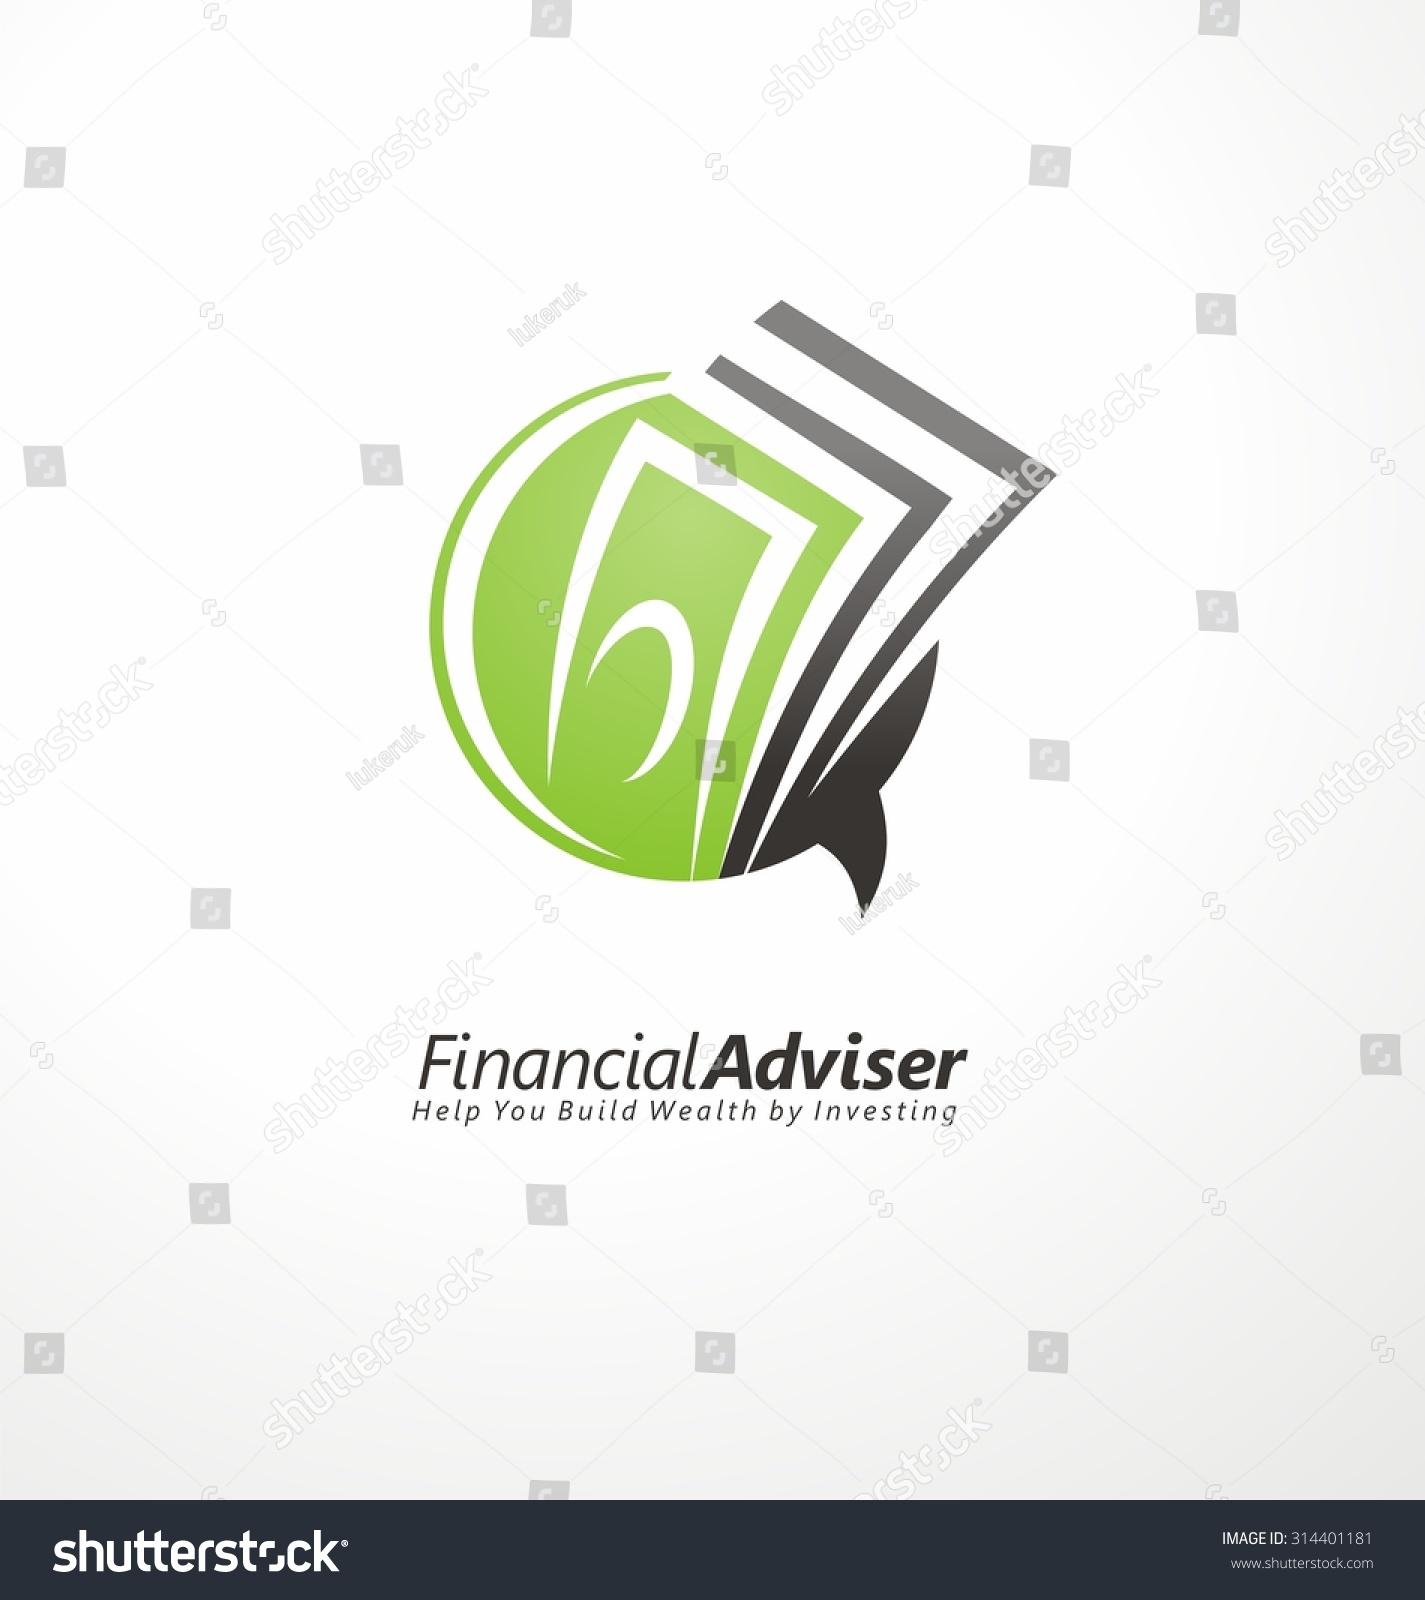 Finance Logo: Financial Adviser Logo Design Layout. Business And Finance